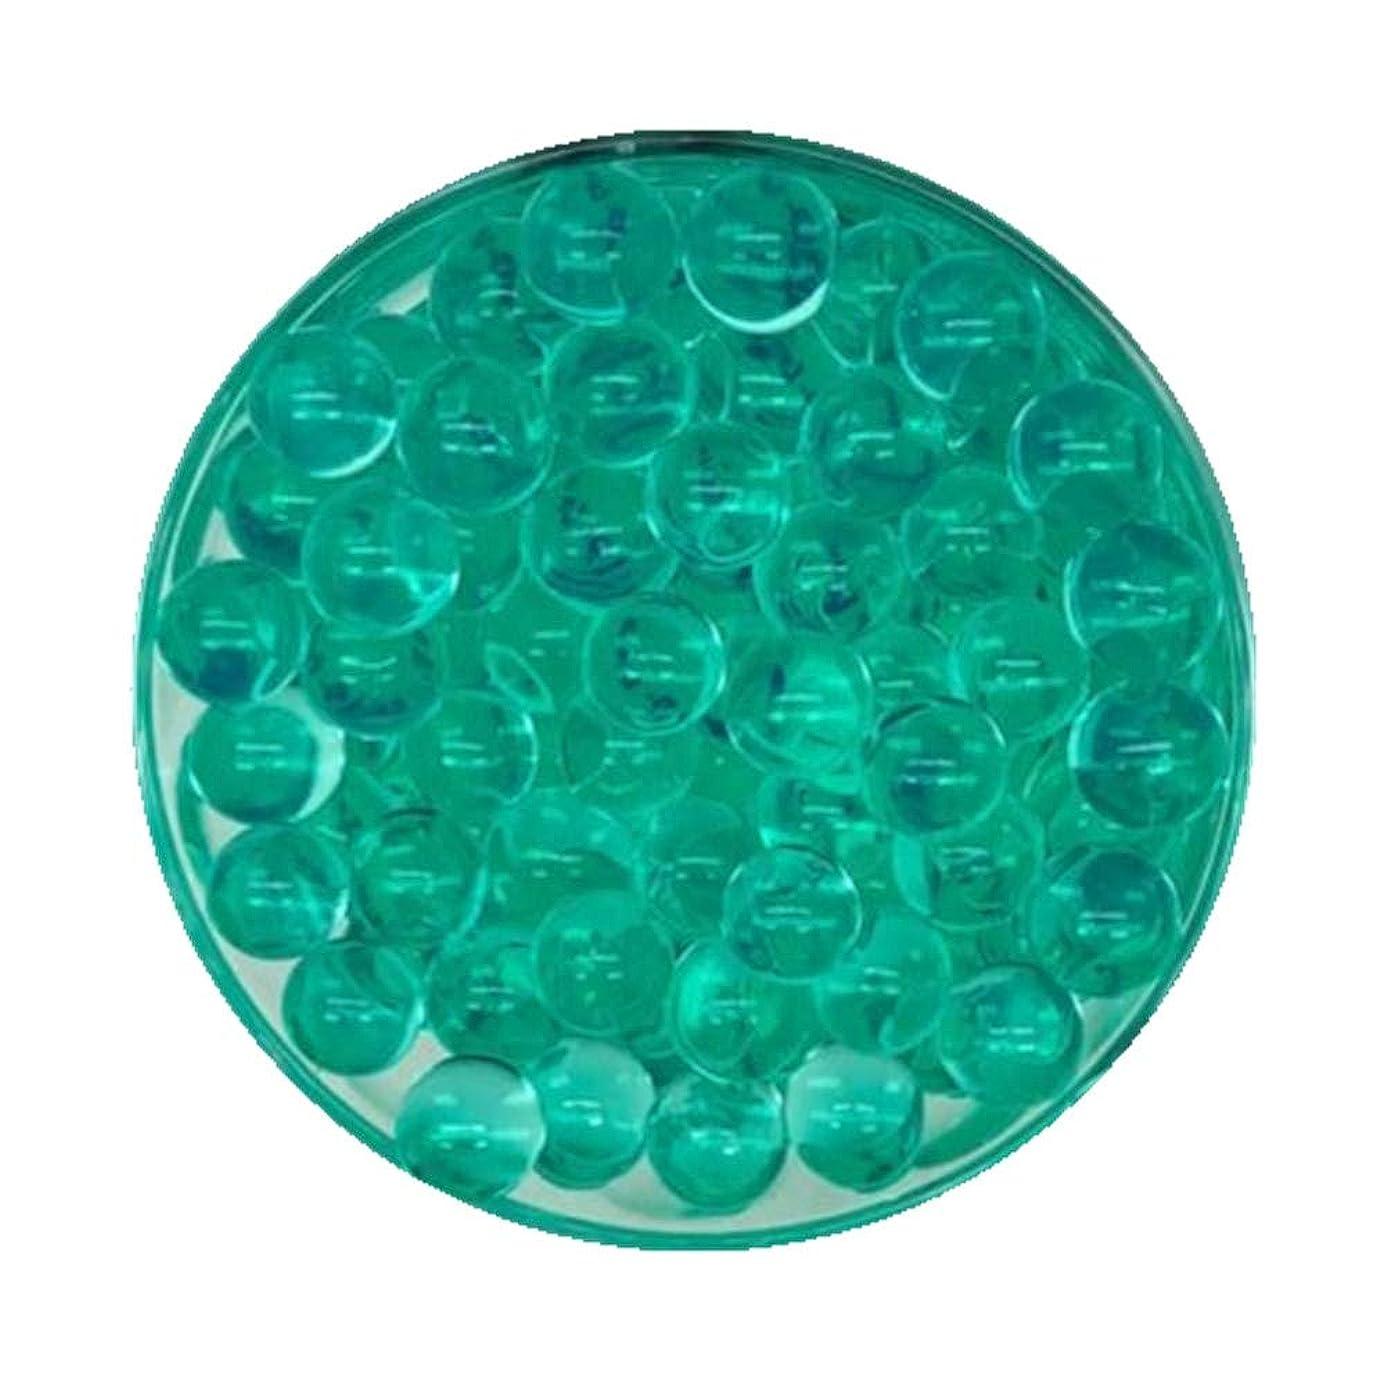 4000 Pcs Crystal Soil Water Beads Growing Magic Jelly Balls Bio Gel Wedding Casamento Vase Fillers (Turquoise)